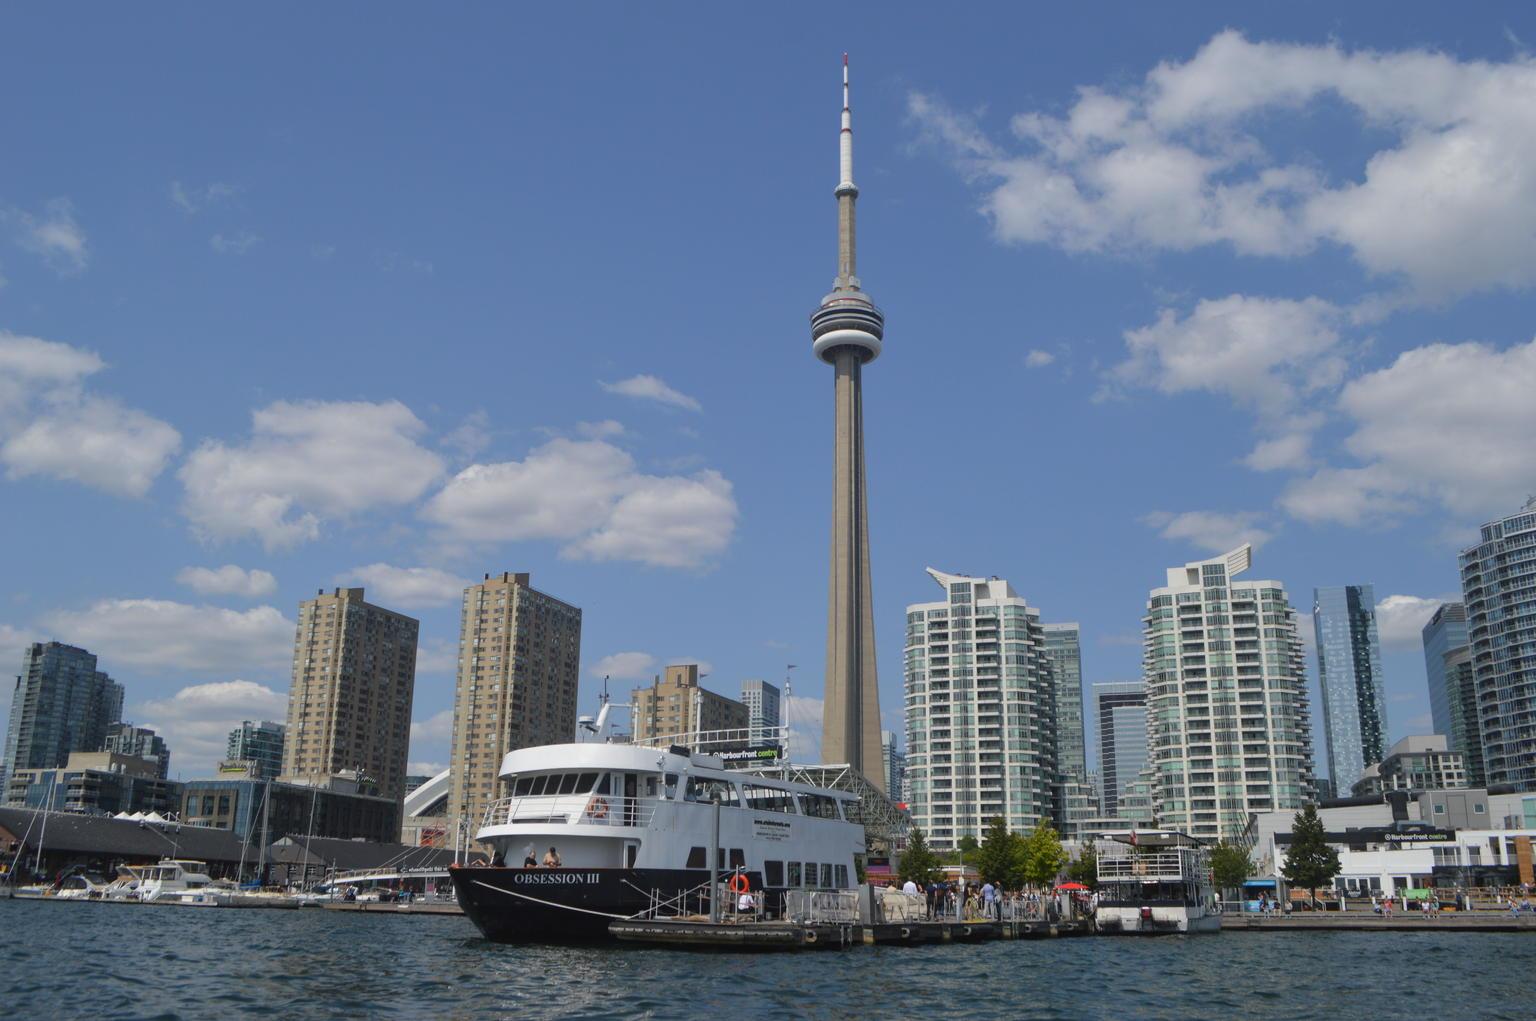 MÁS FOTOS, 1-Hour Toronto Harbour Tour with Live Narration